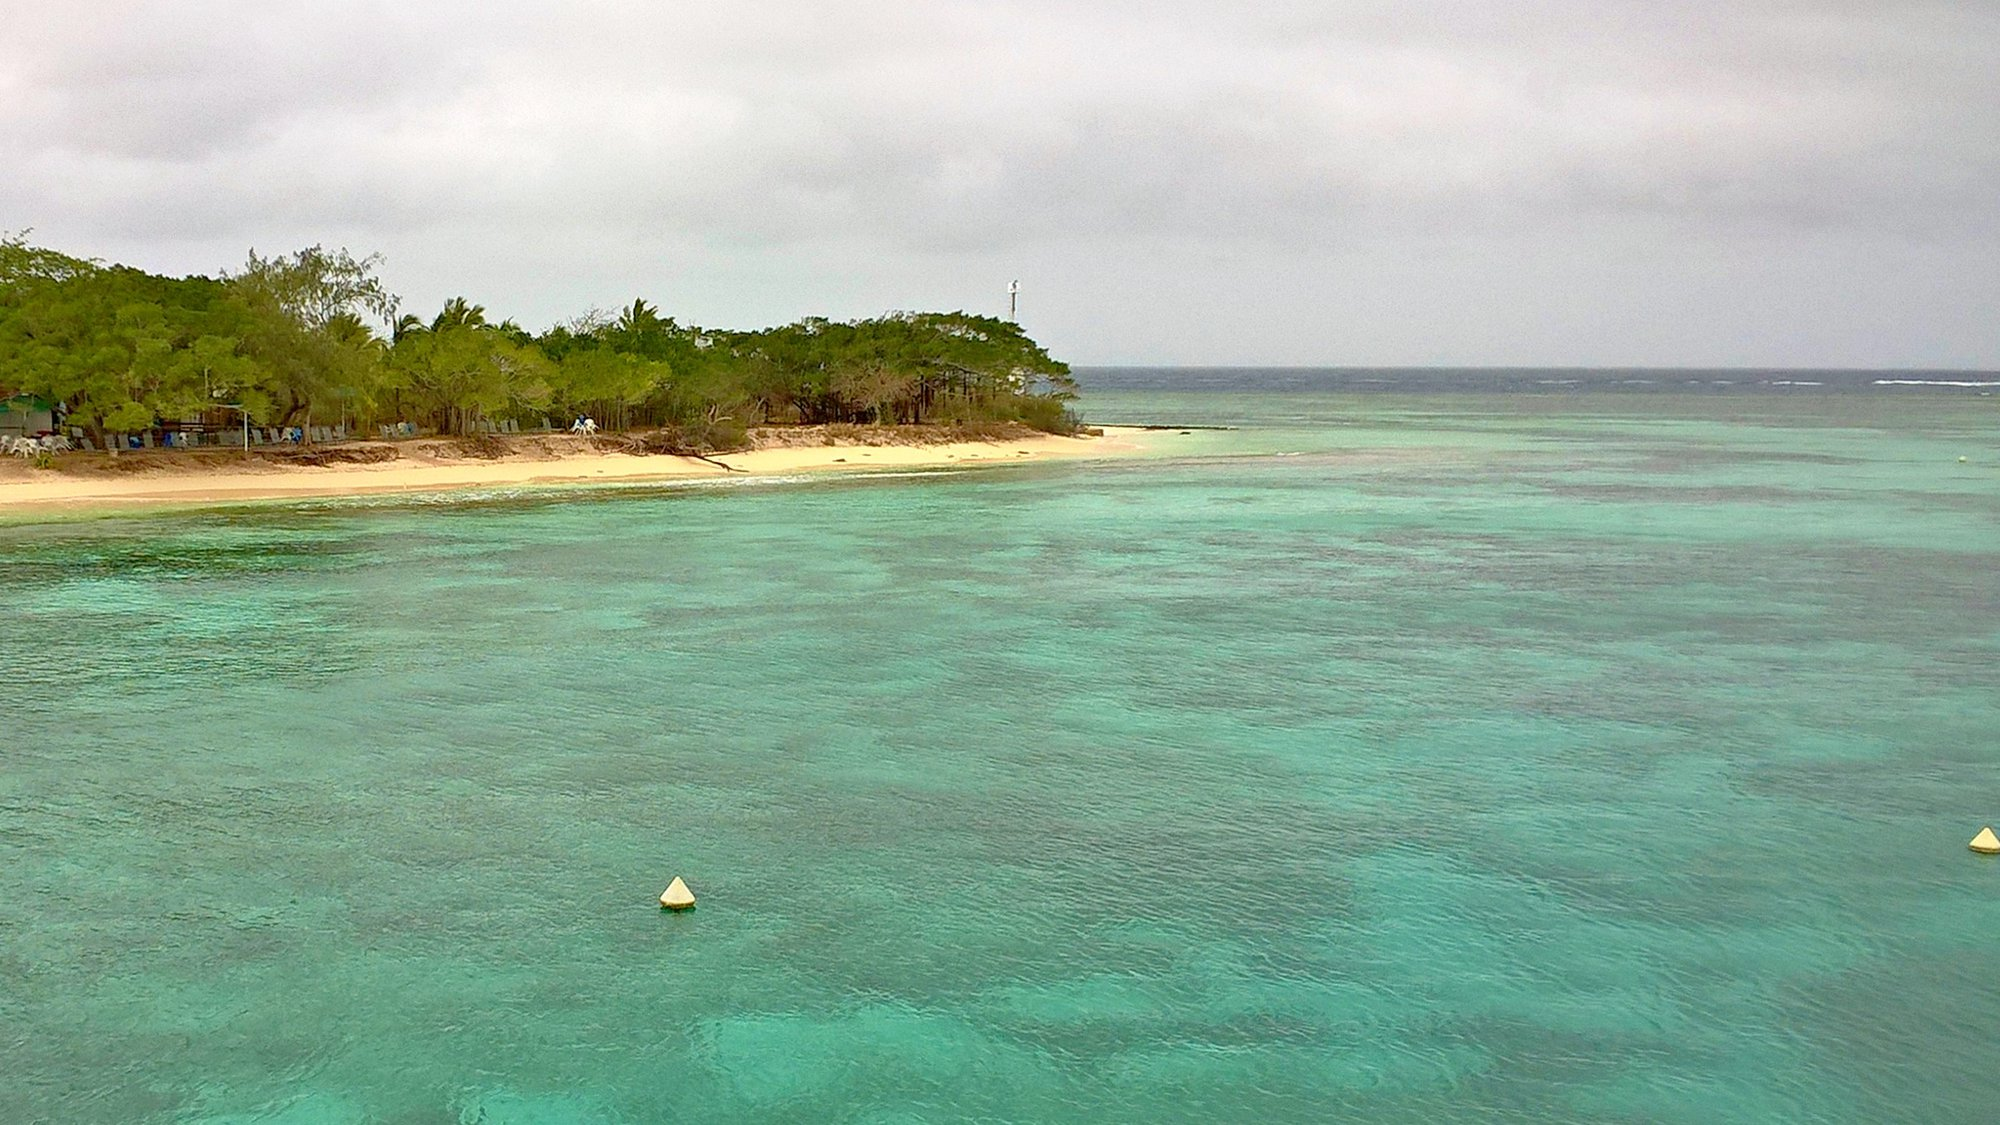 lagúna okolo ostrova Amedée